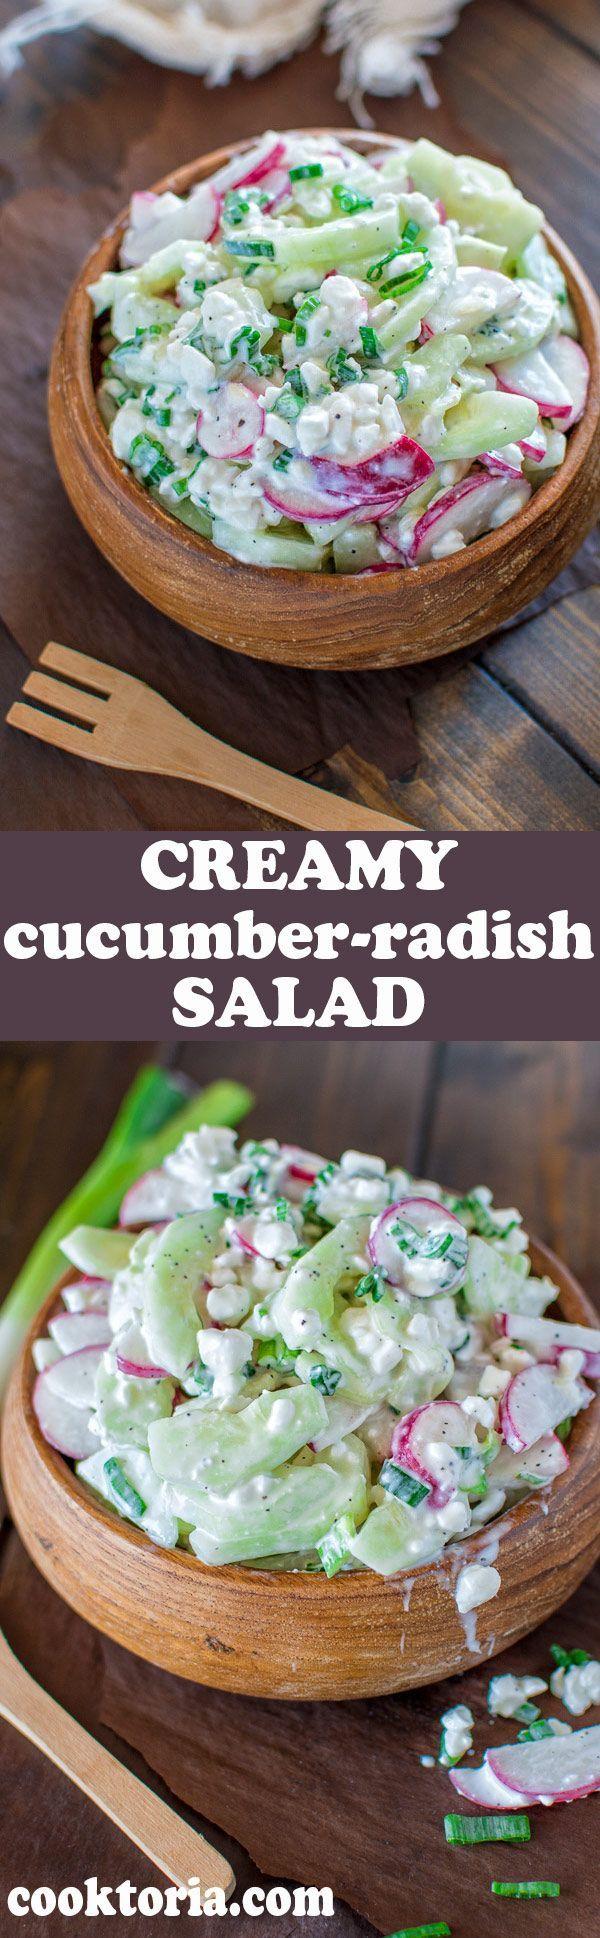 Creamy Cucumber-Radish Salad